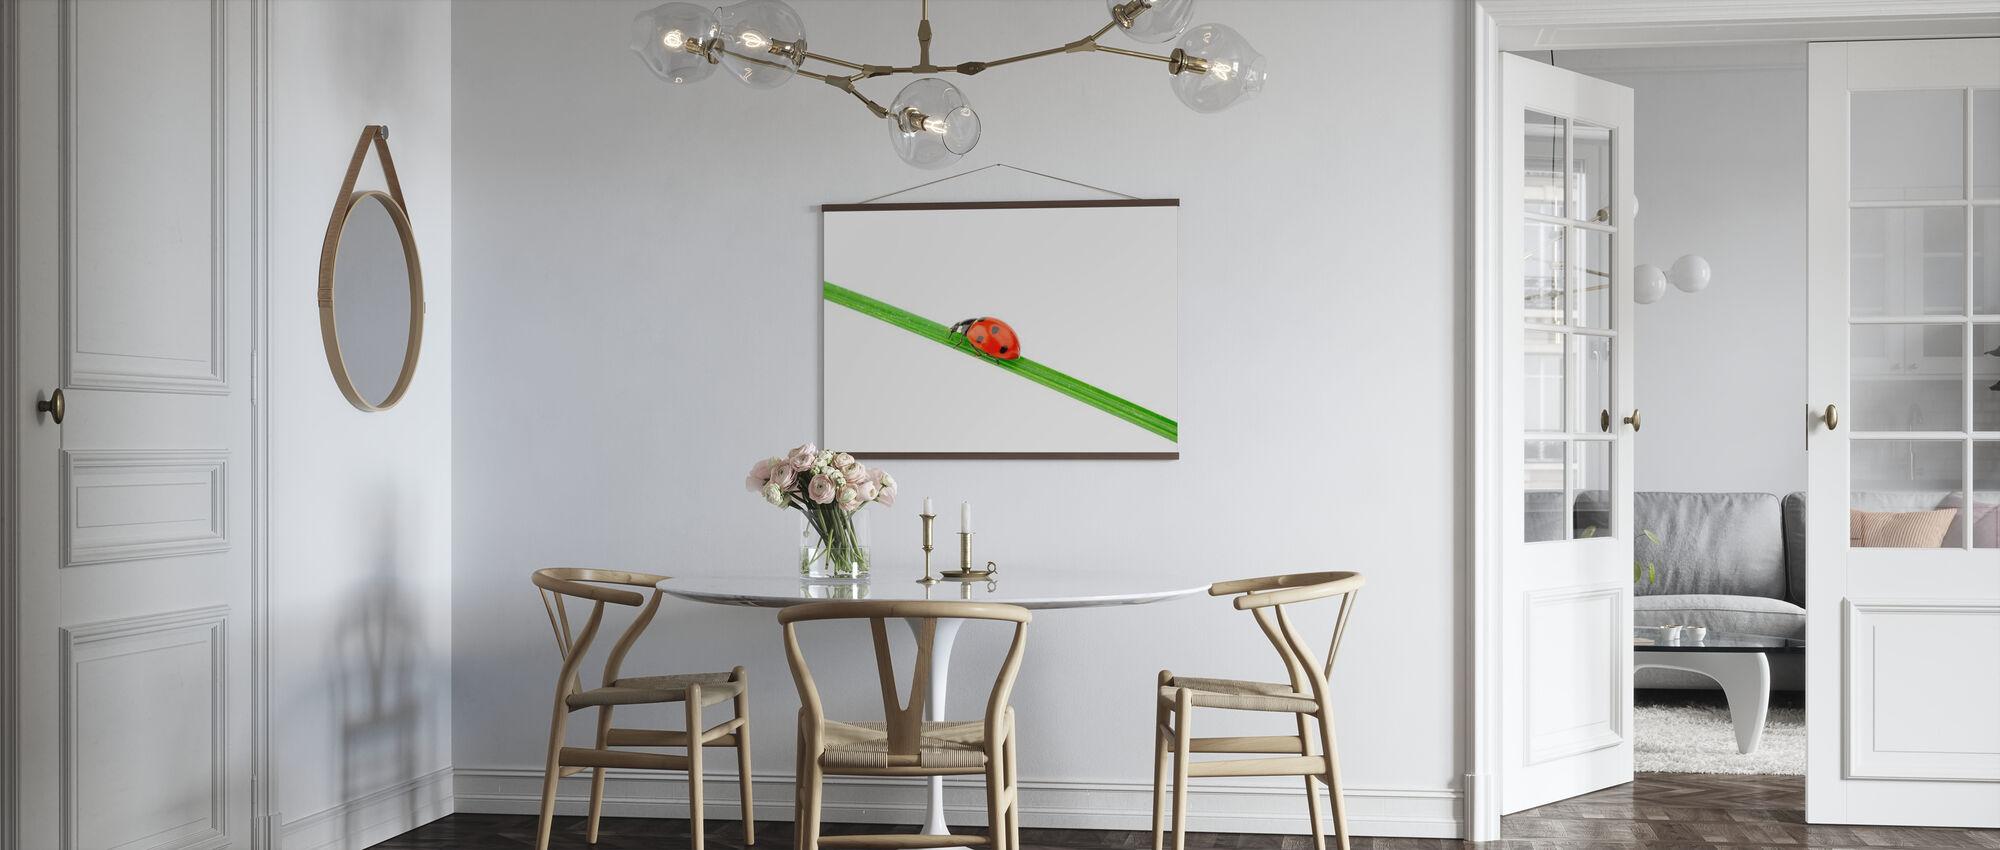 Ladybug on a Straw - Poster - Kitchen